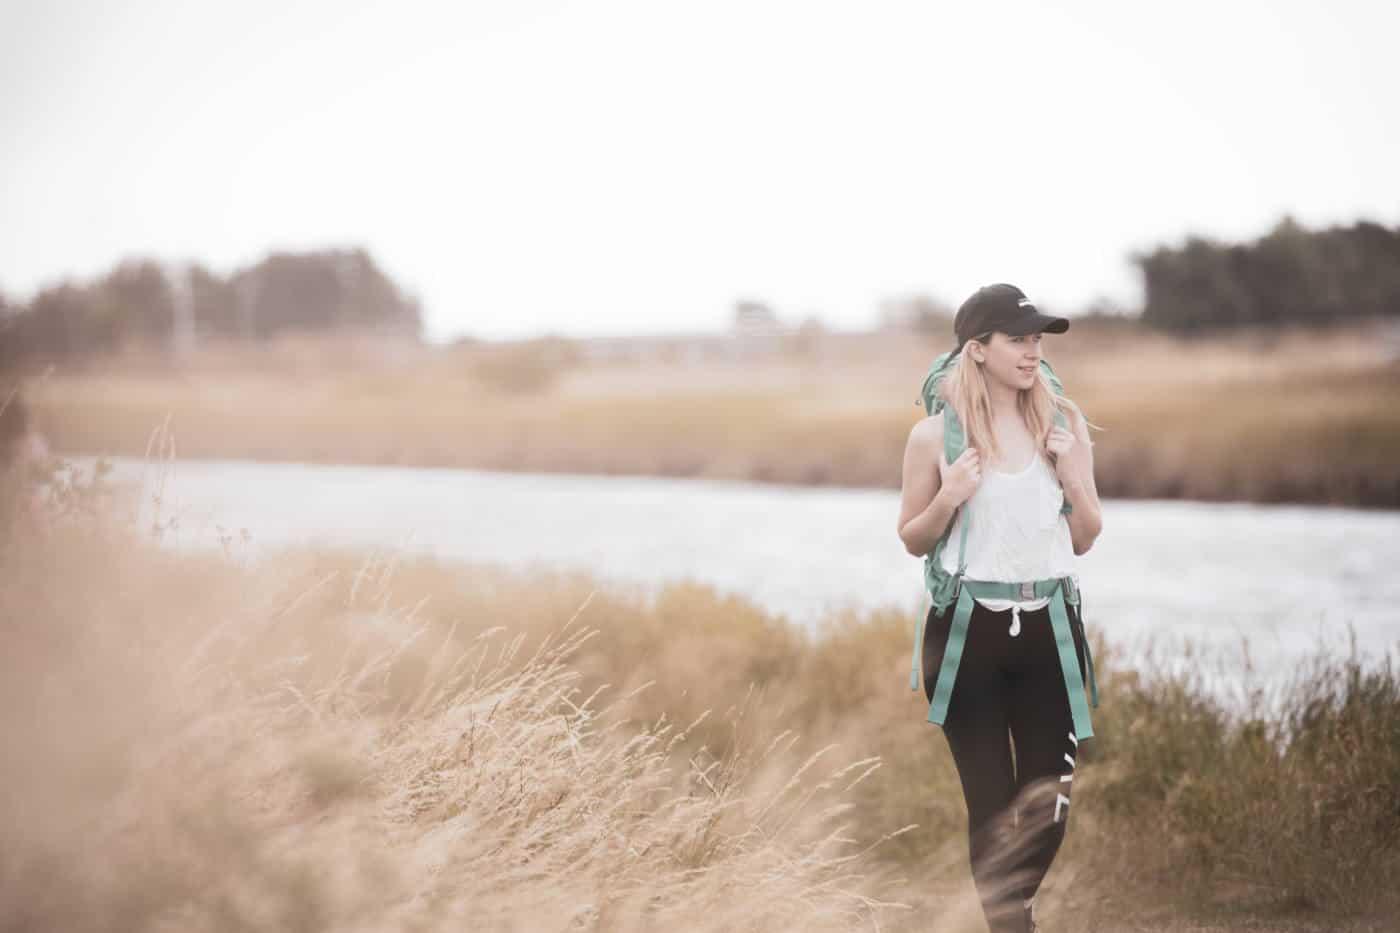 Best Hiking Backpack for Women